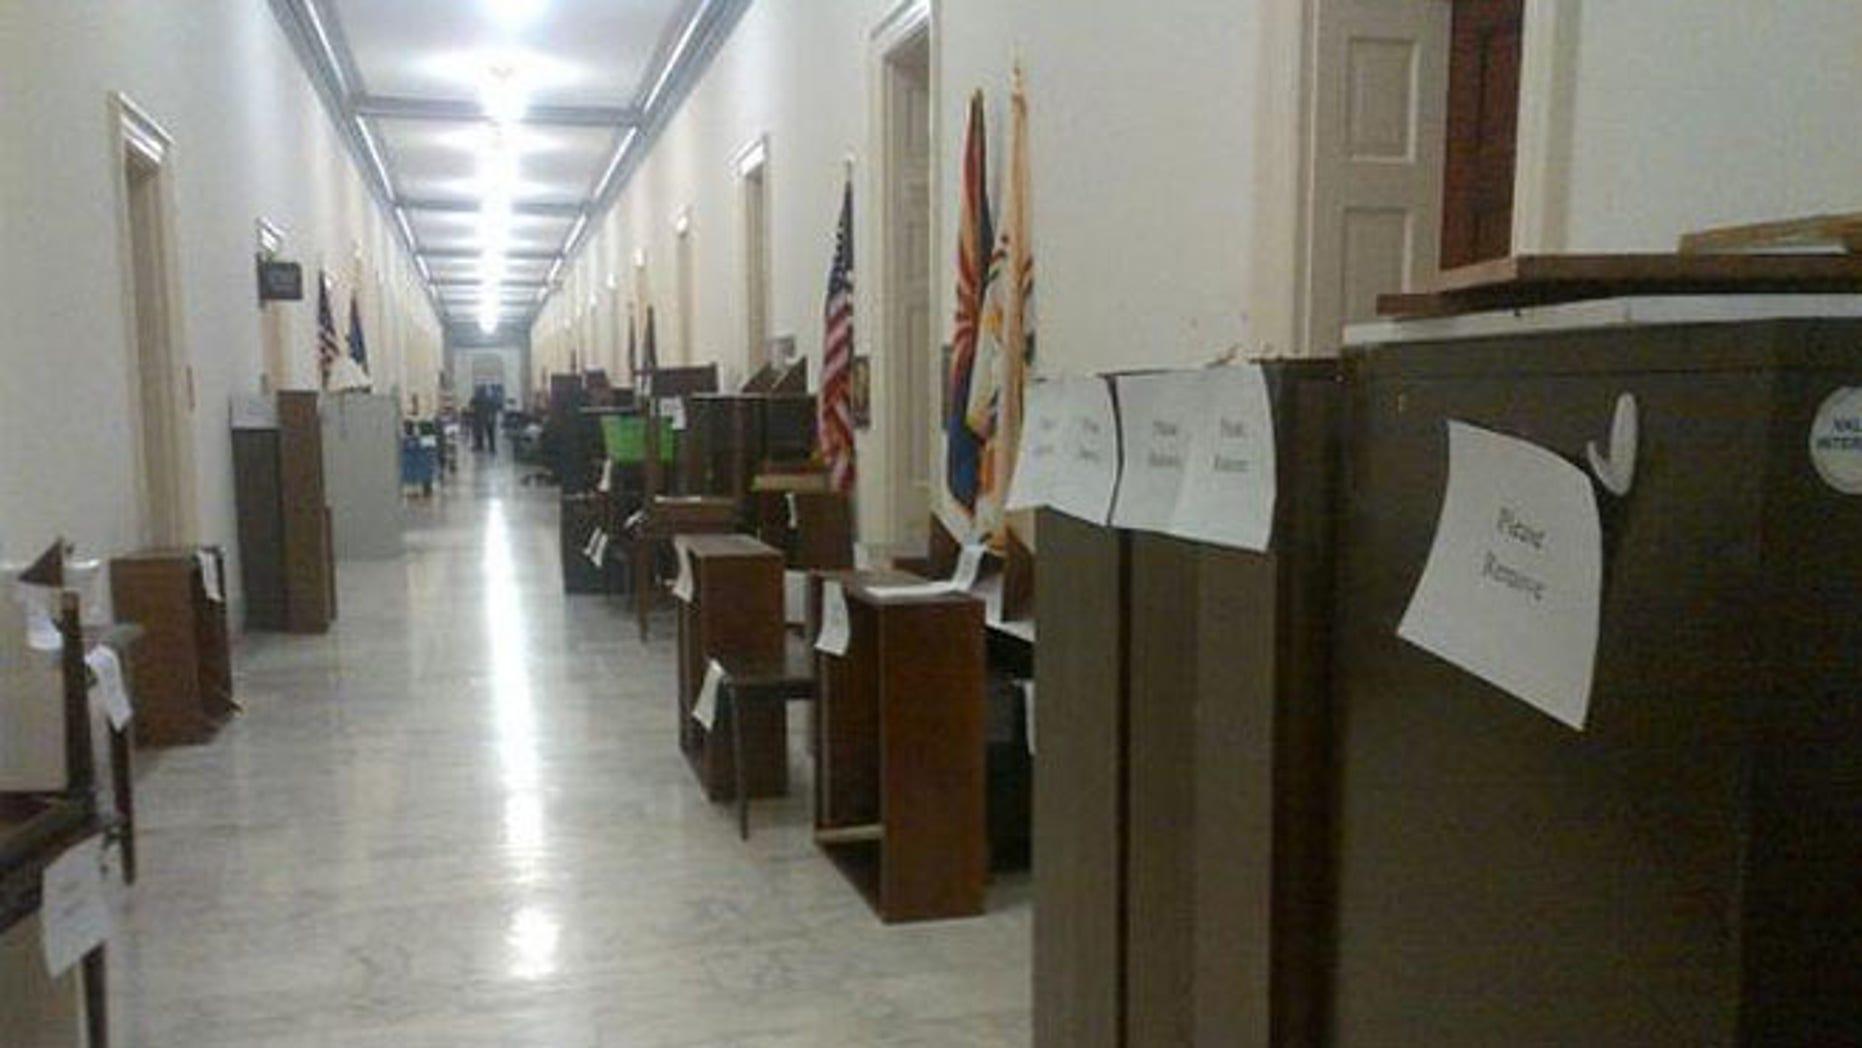 Dec. 19, 2014: A hallway of a Capitol Hill office building, Washington, D.C.